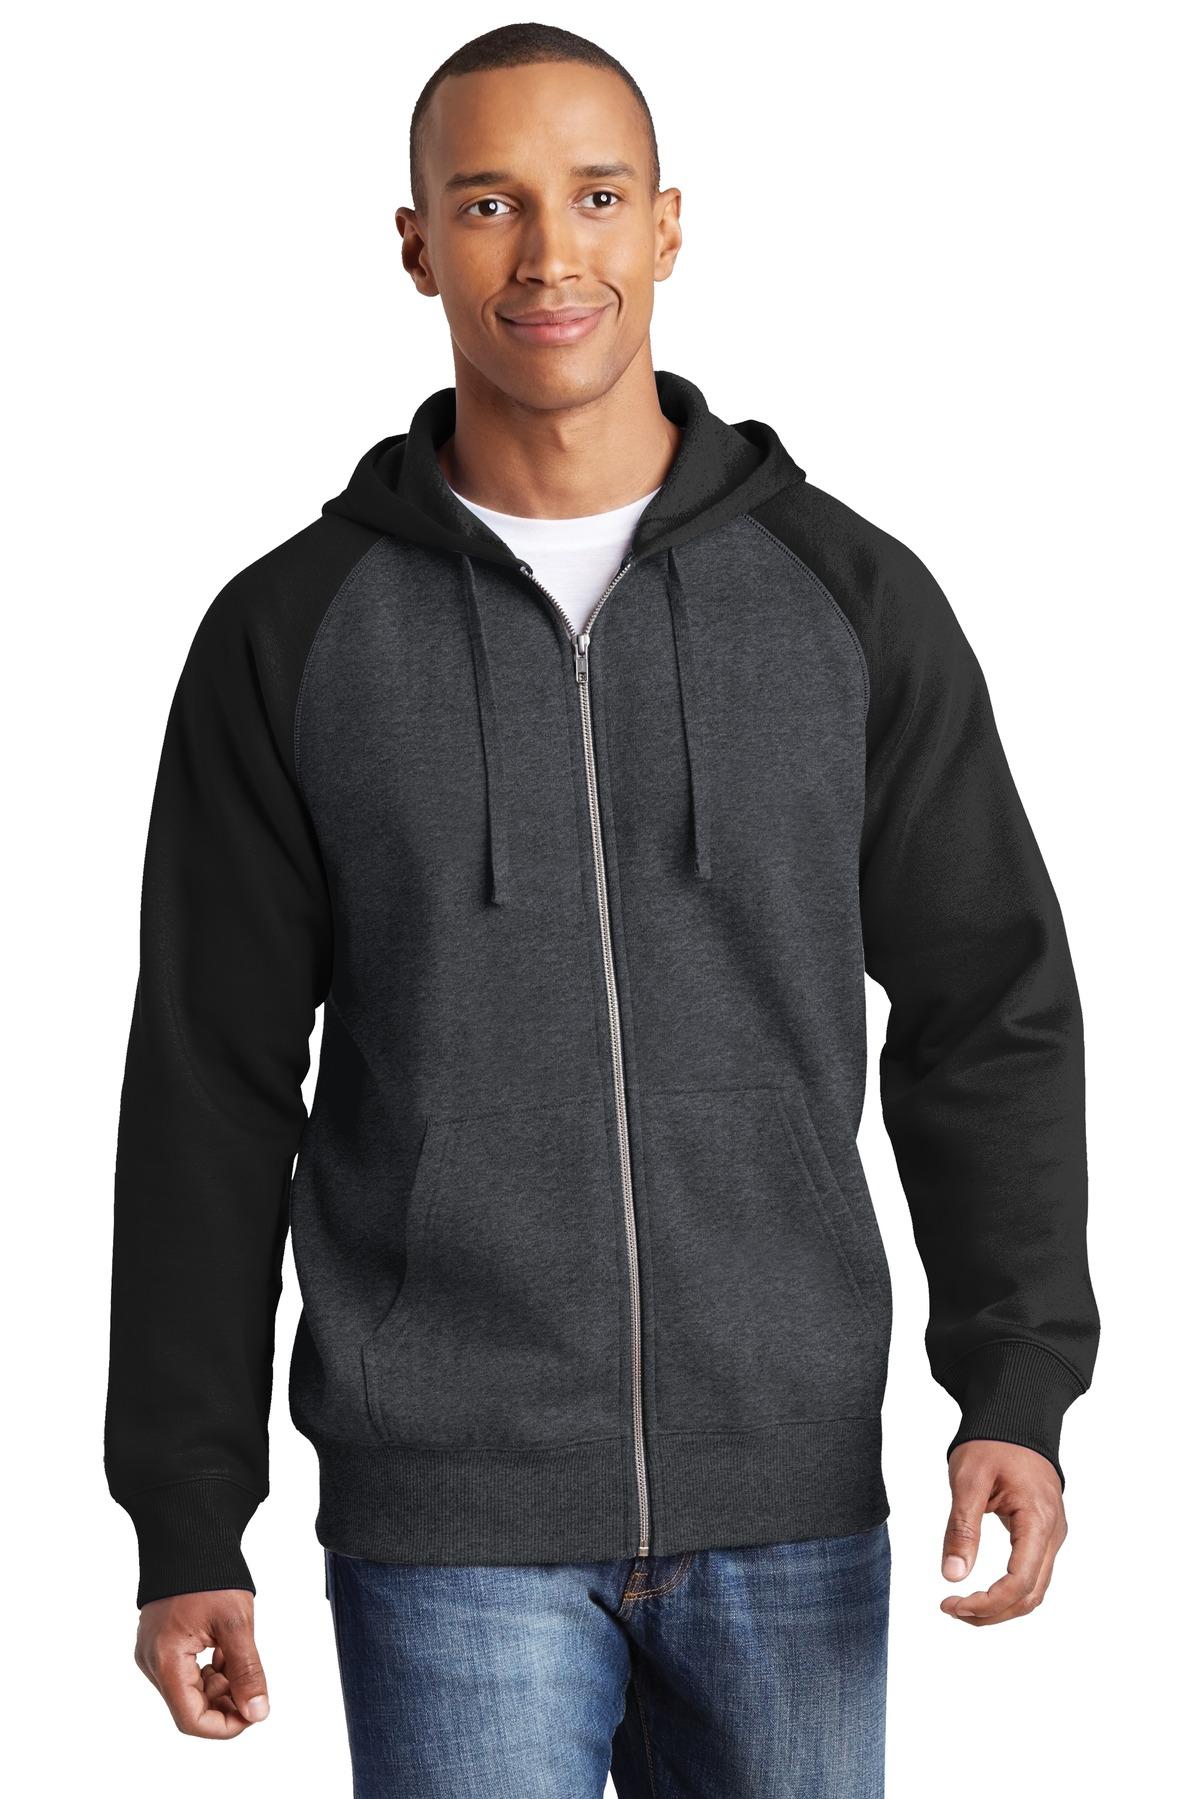 Sport-Tek ST269 - Raglan Colorblock Full-Zip Hooded Fleece Jacket ...